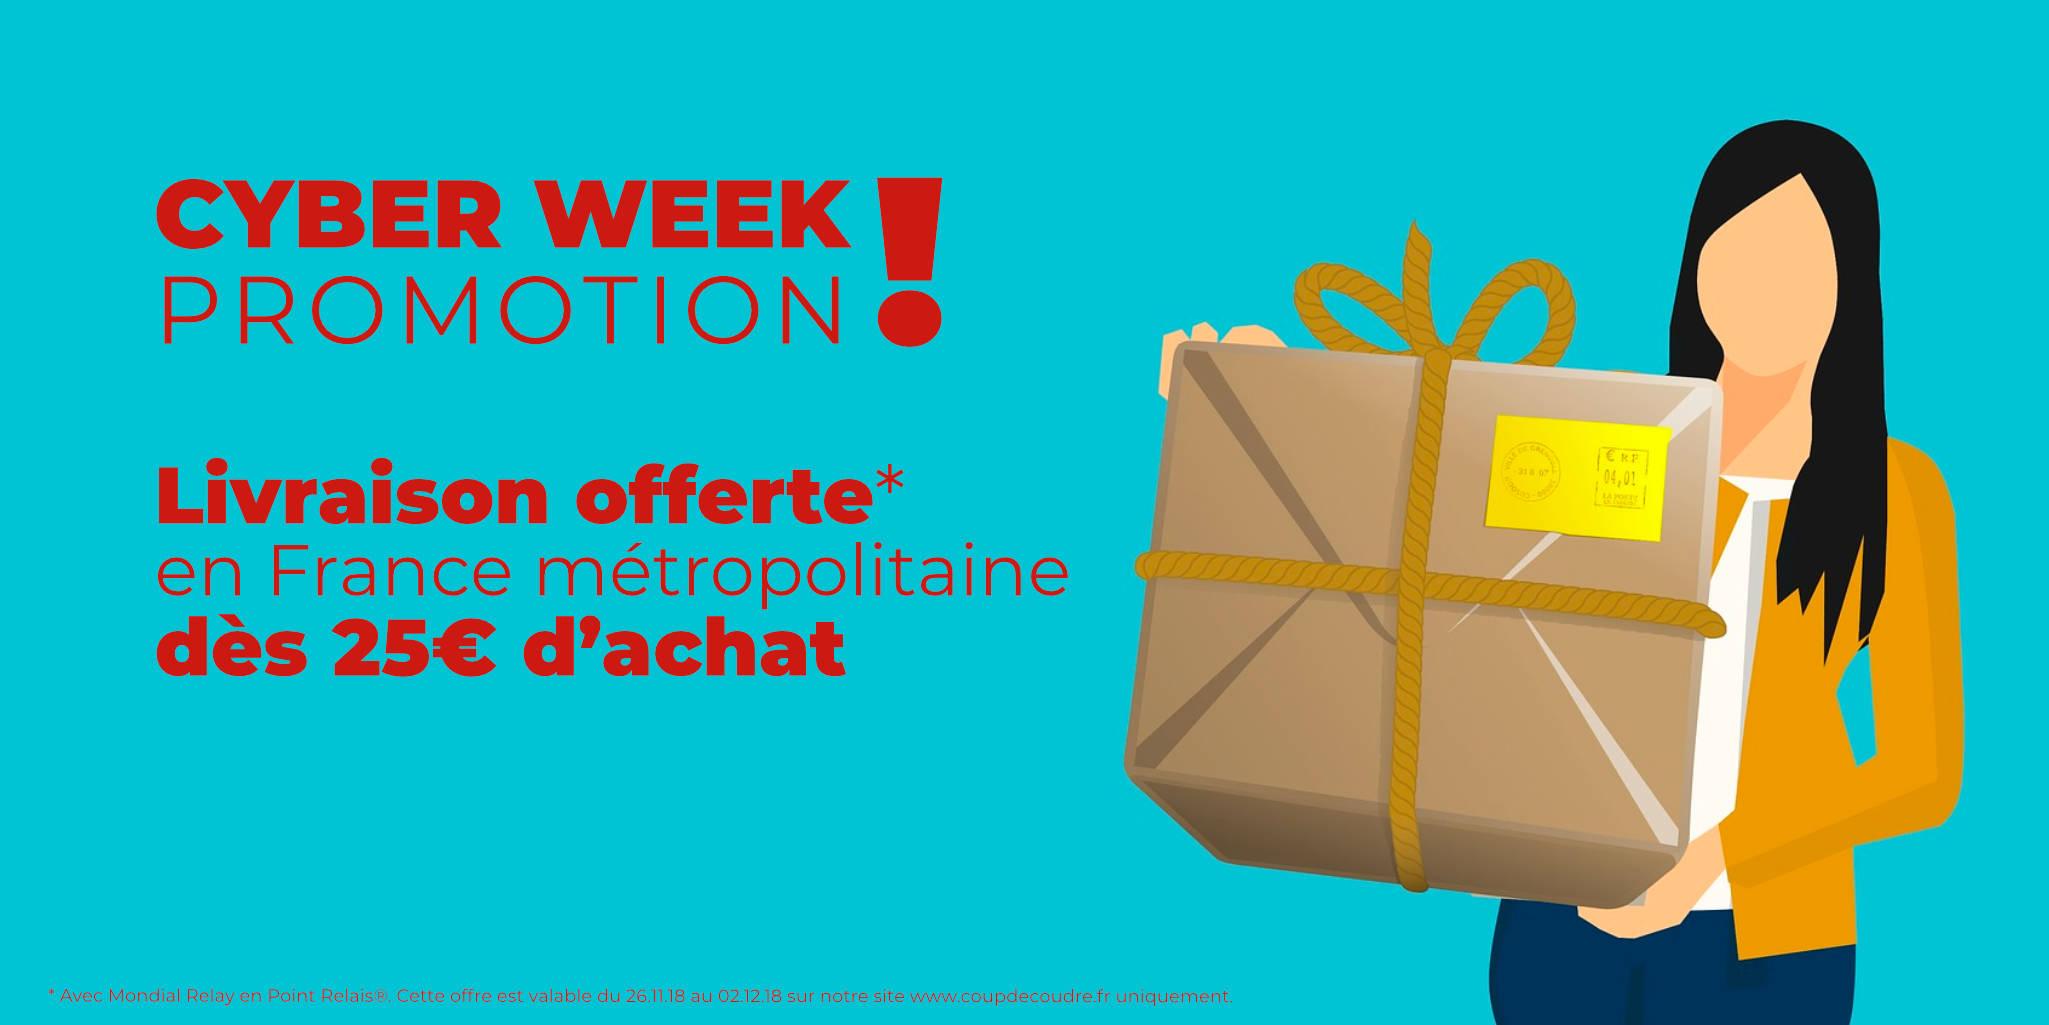 Cyber Week promo @ Coup de coudre